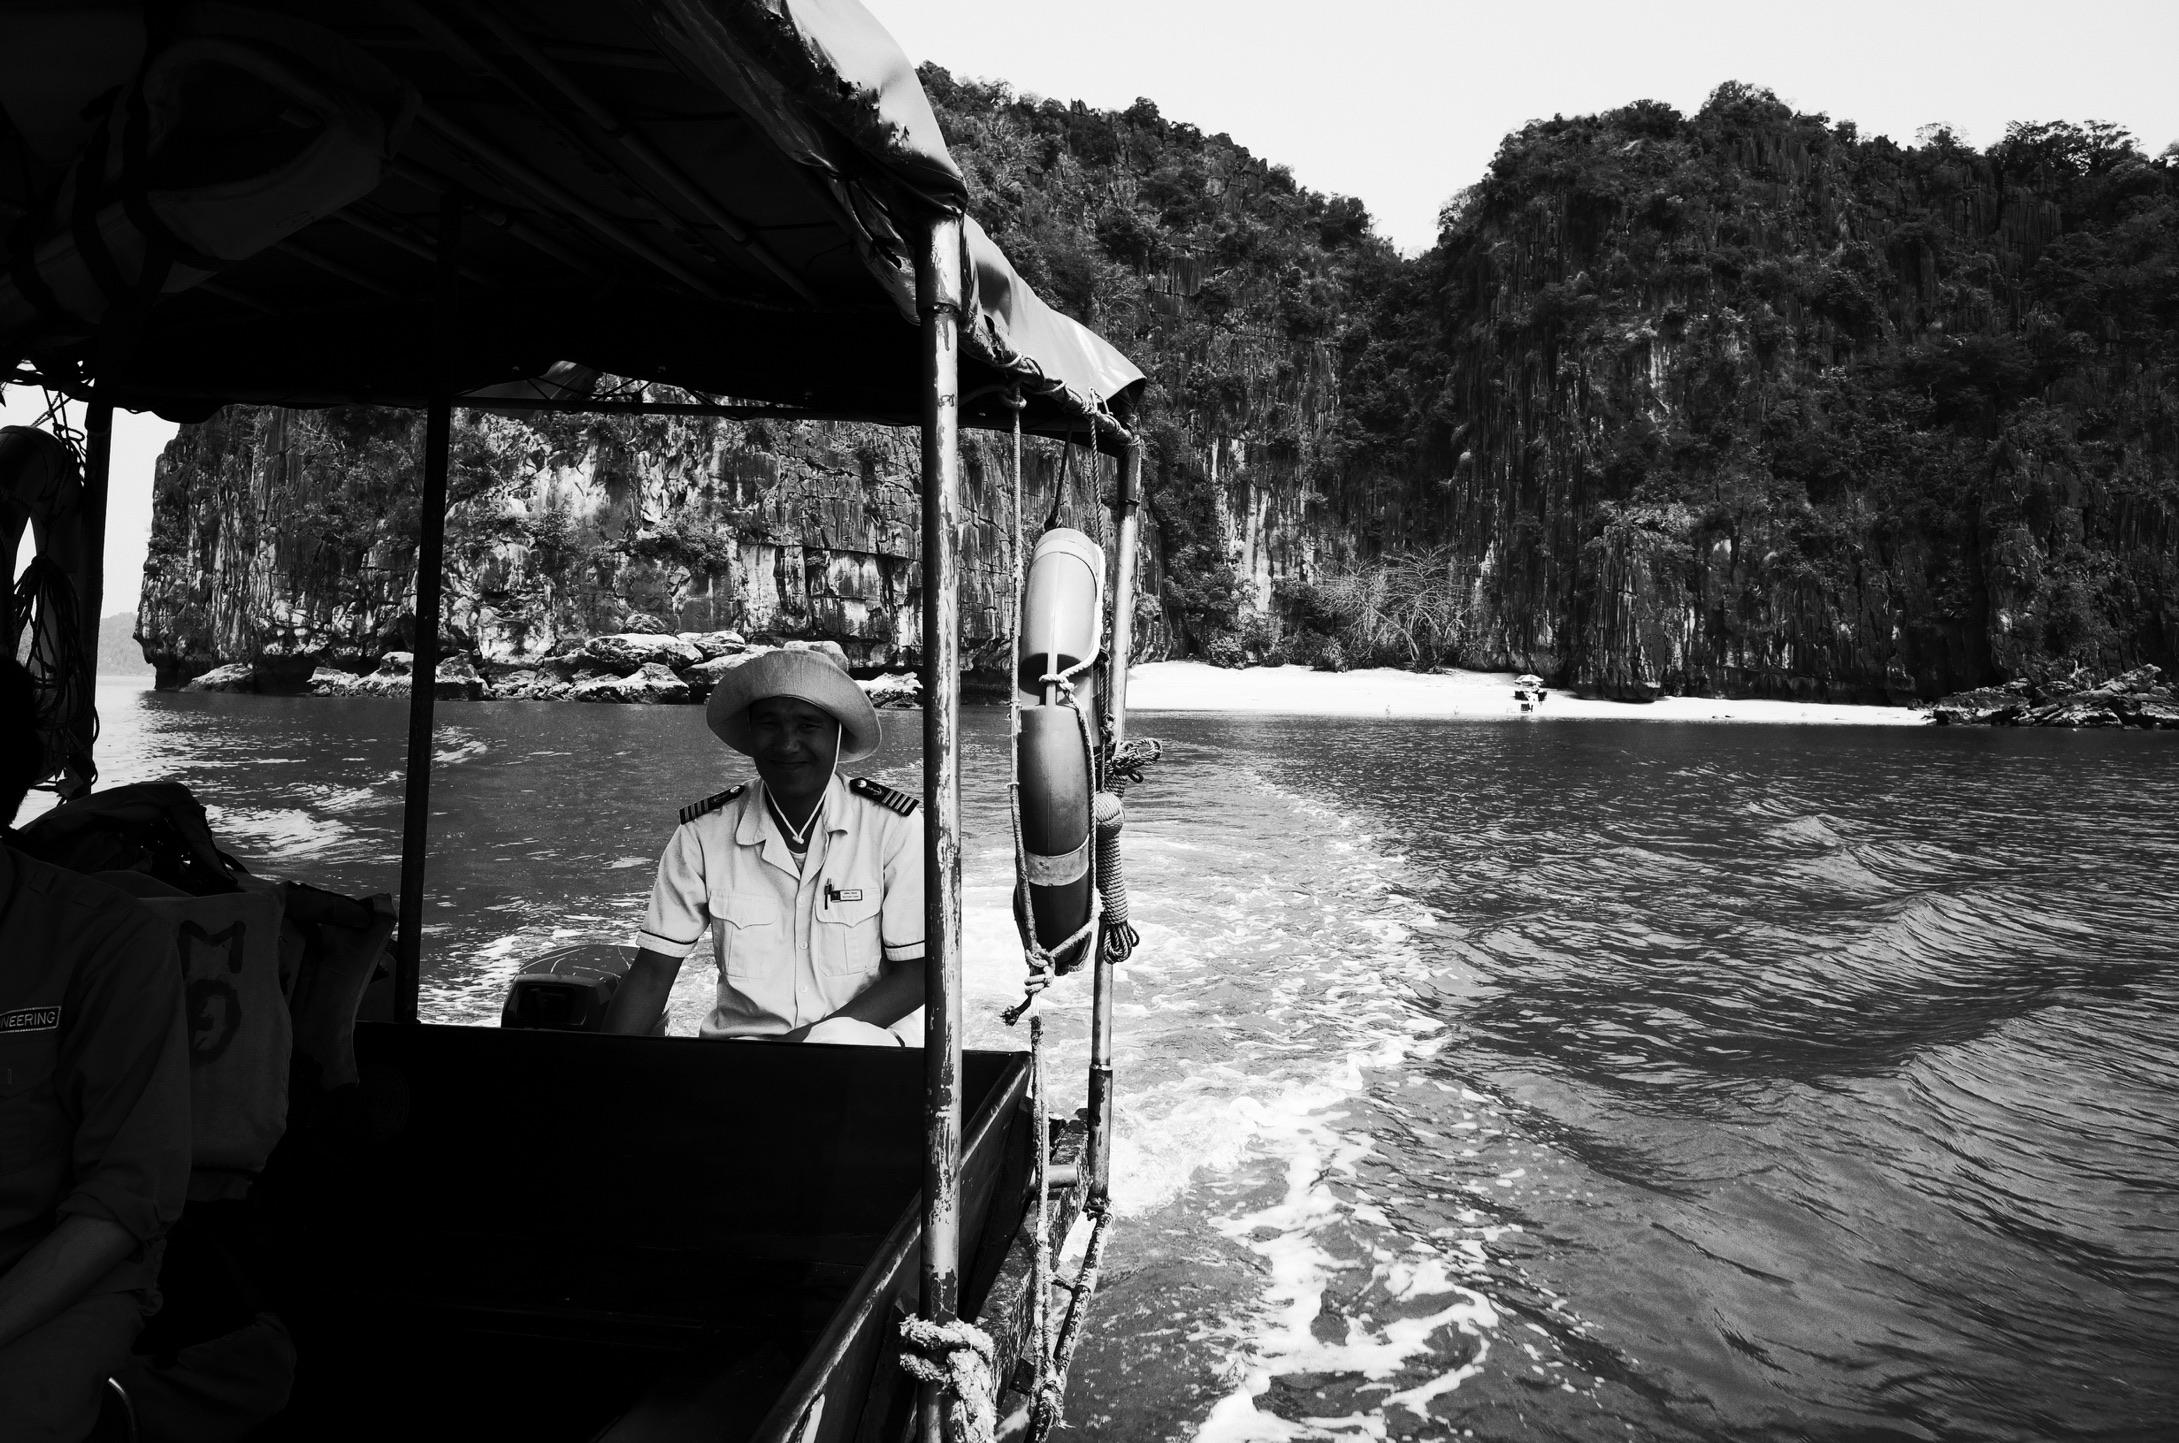 Image from Ha Long Bay